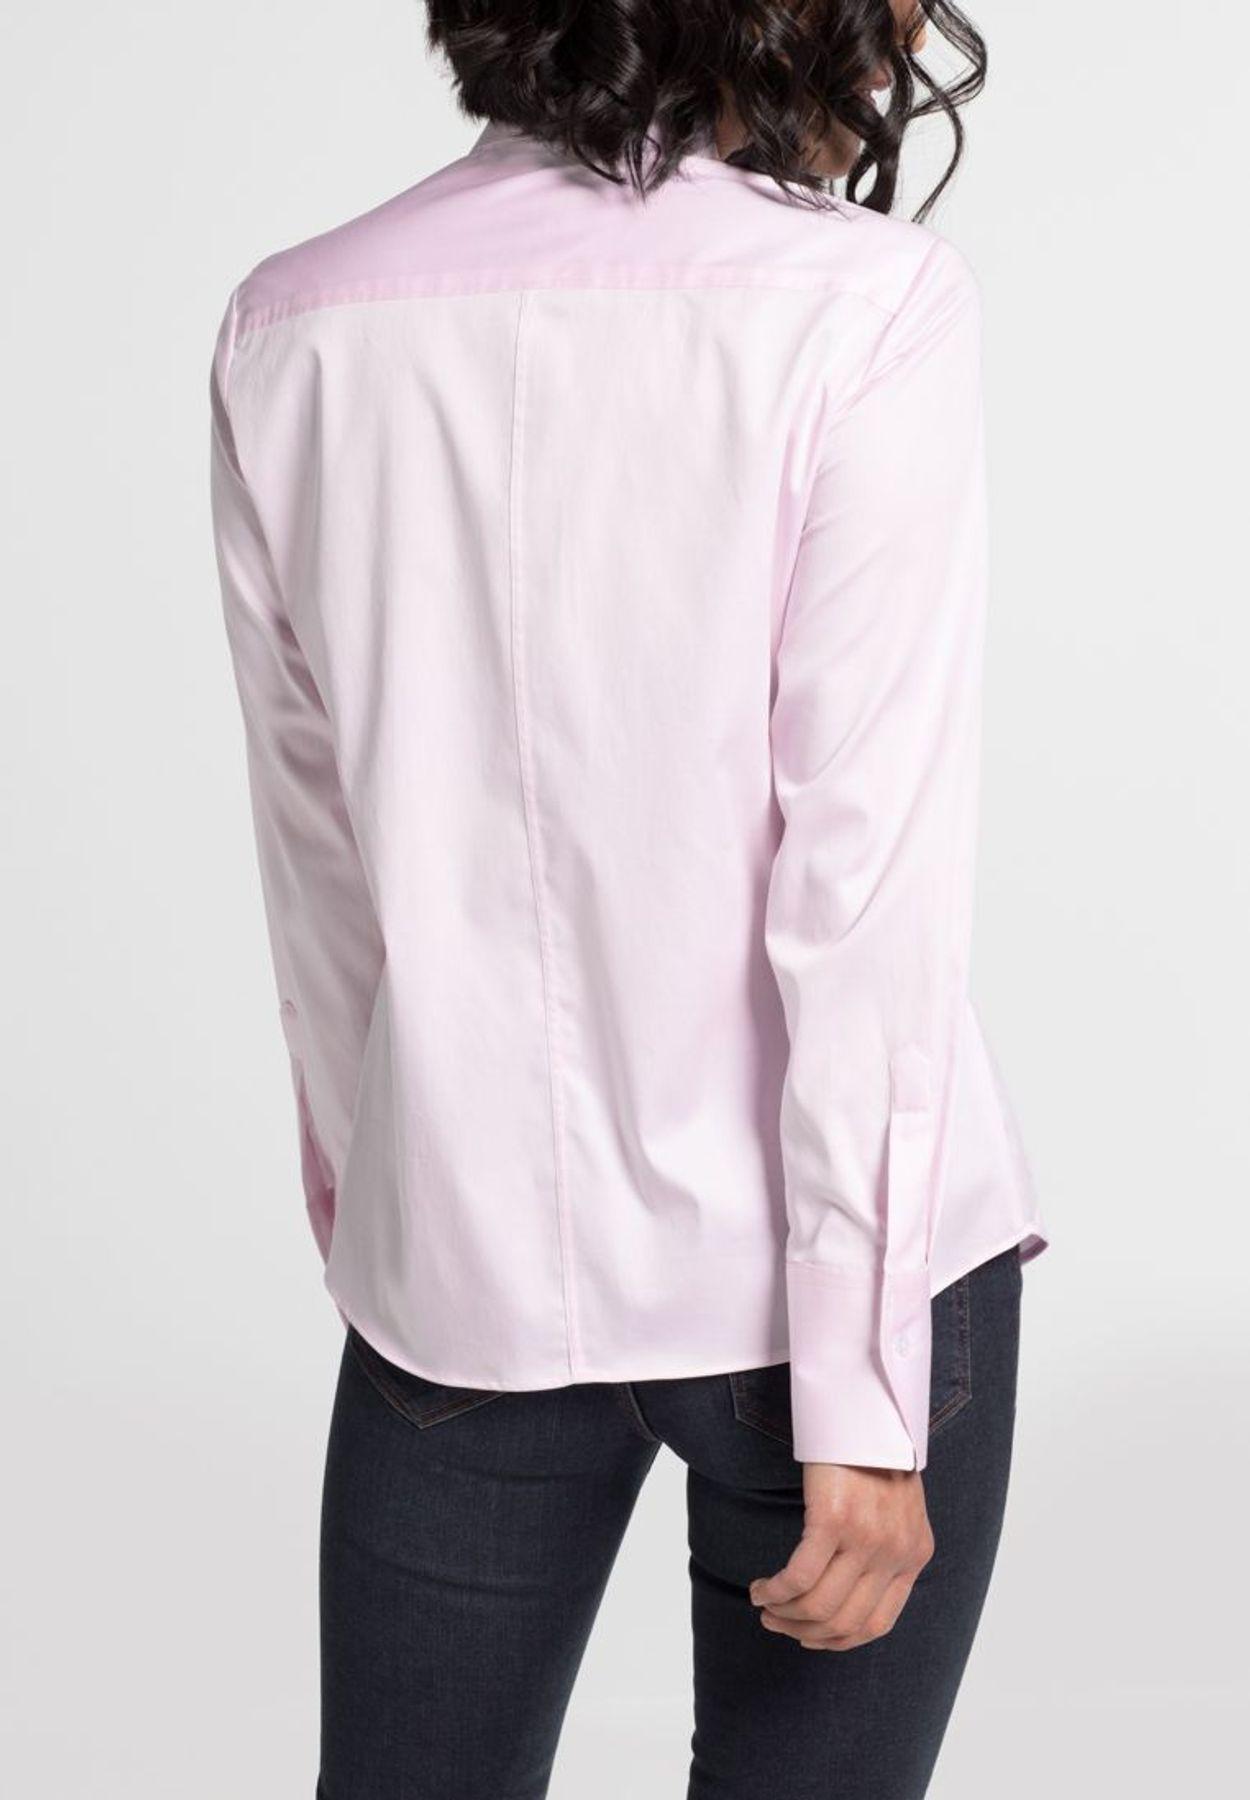 Eterna - Comfort Fit - Damen Langarm Bluse Modern Classic Stretch in versch. Farben (5352 D708) – Bild 21